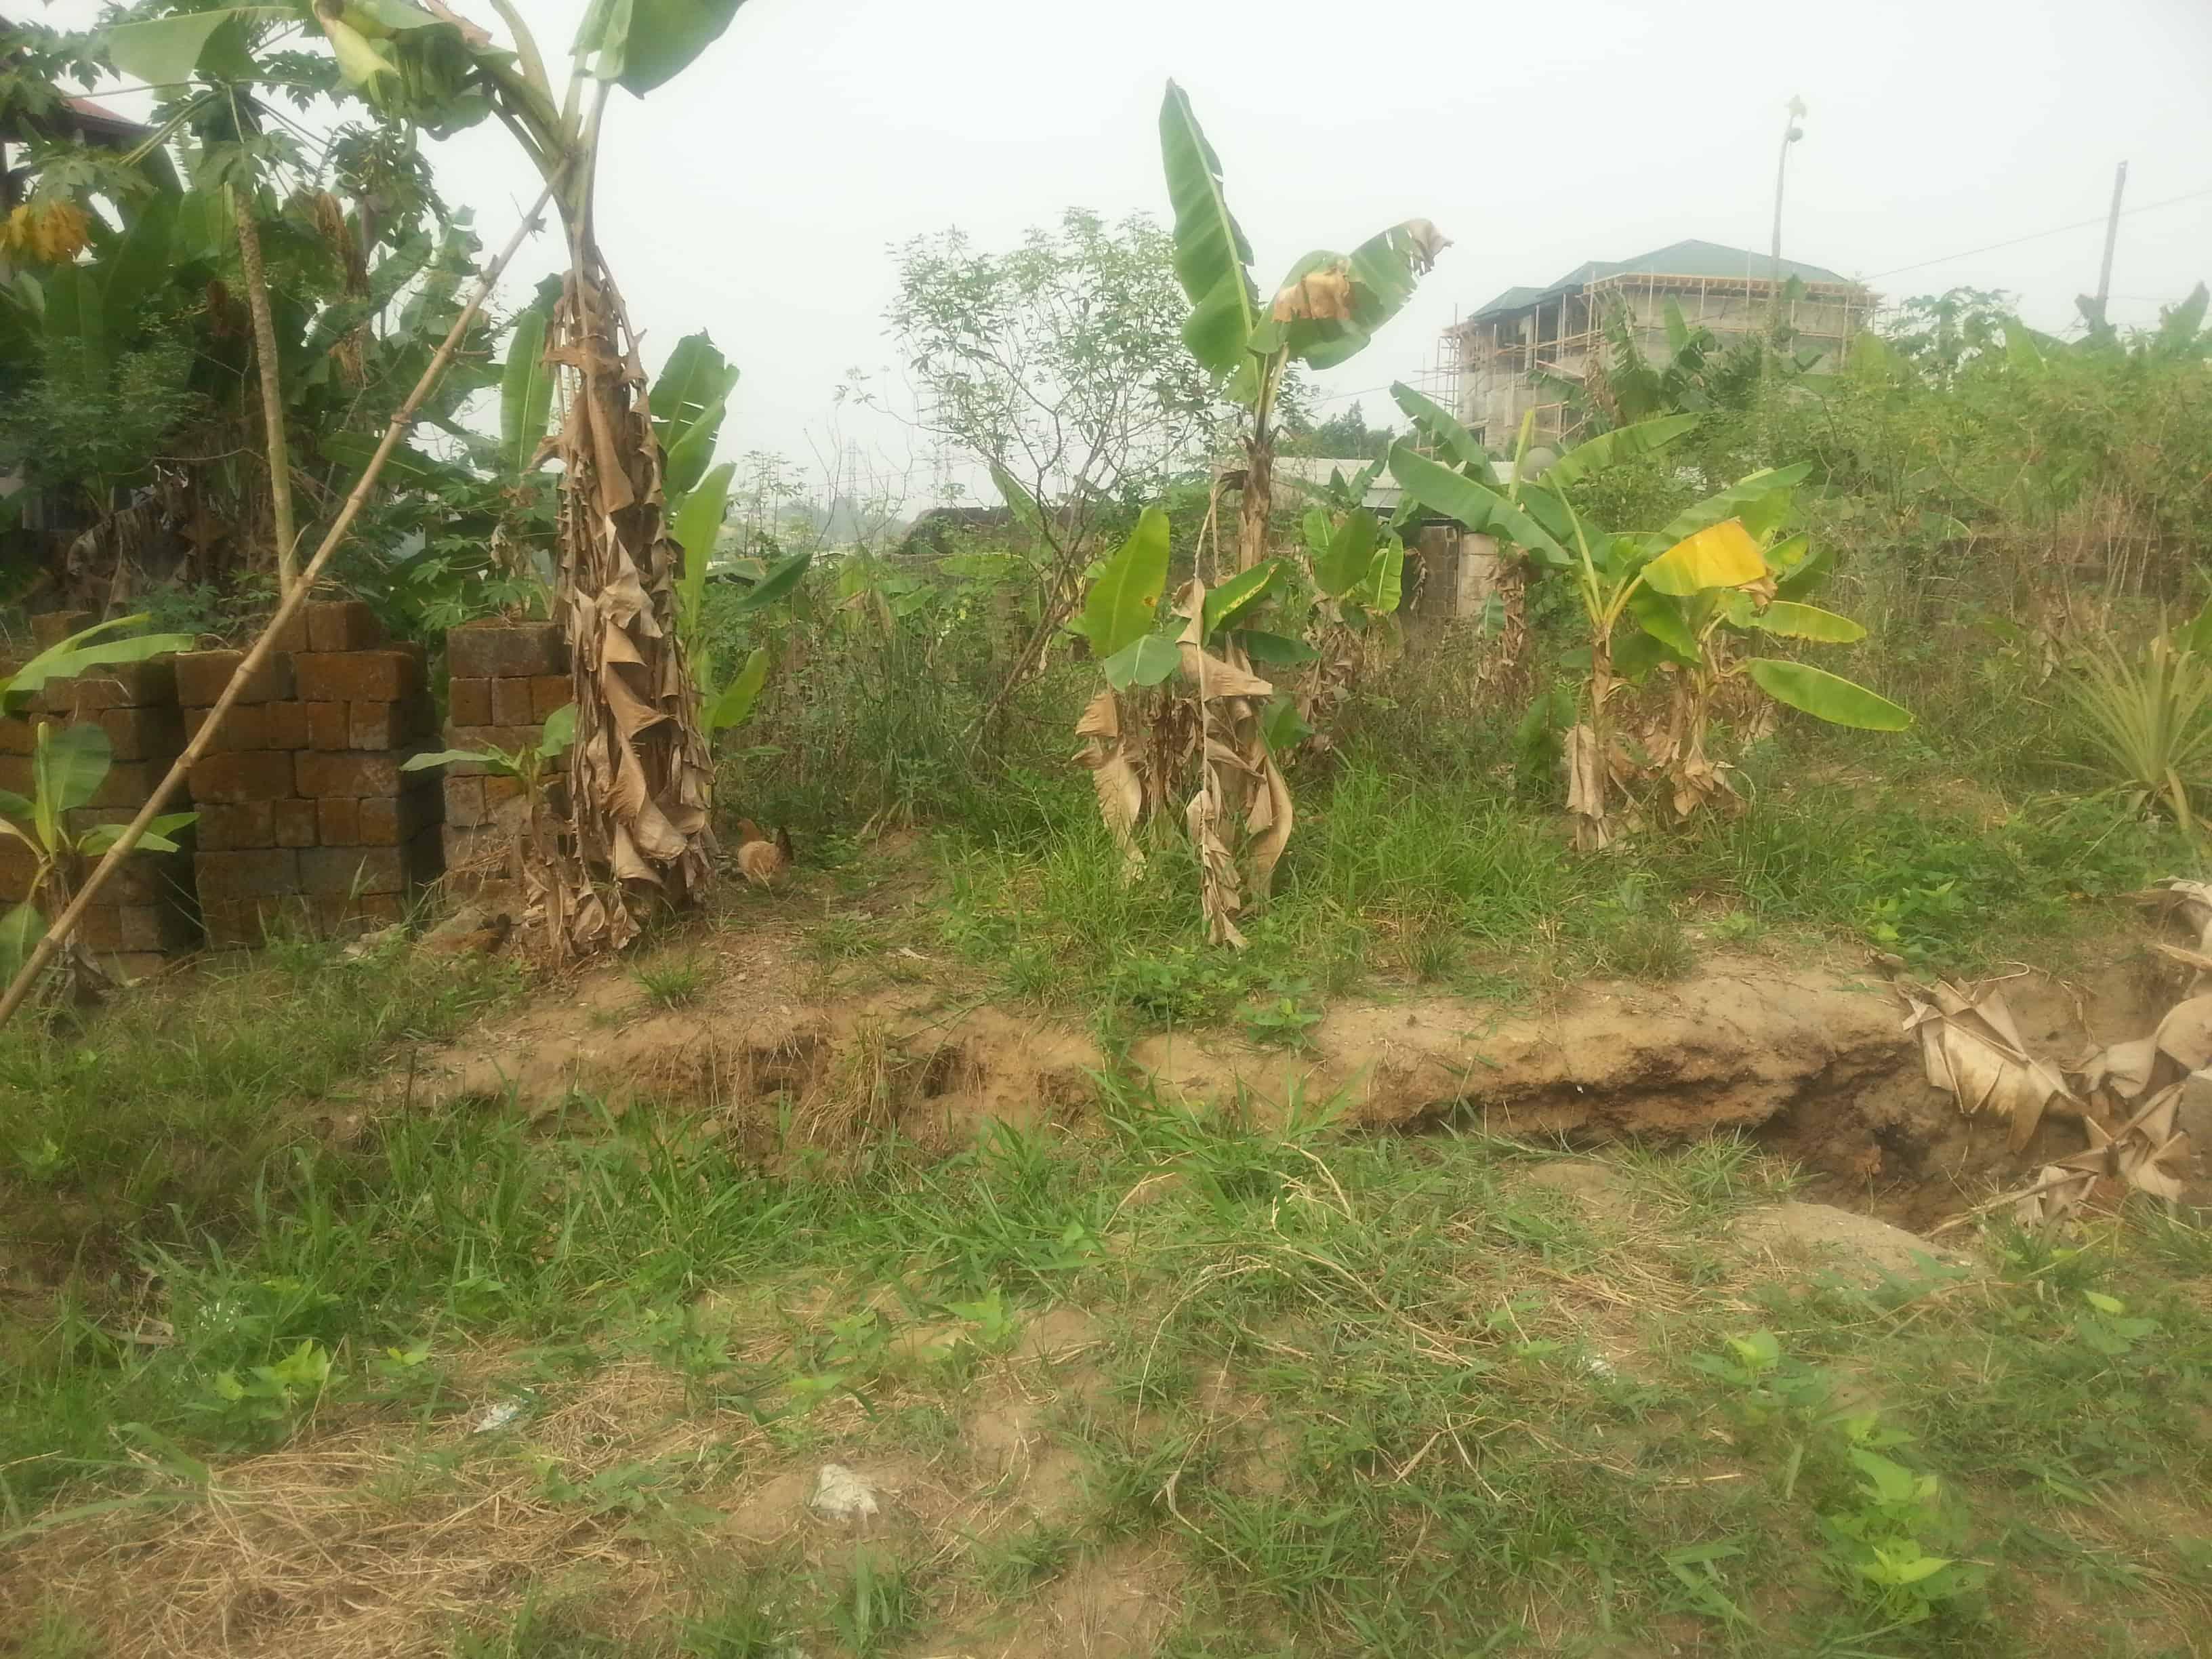 Land for sale at Douala, Yassa, Maetur - 400 m2 - 24 000 000 FCFA